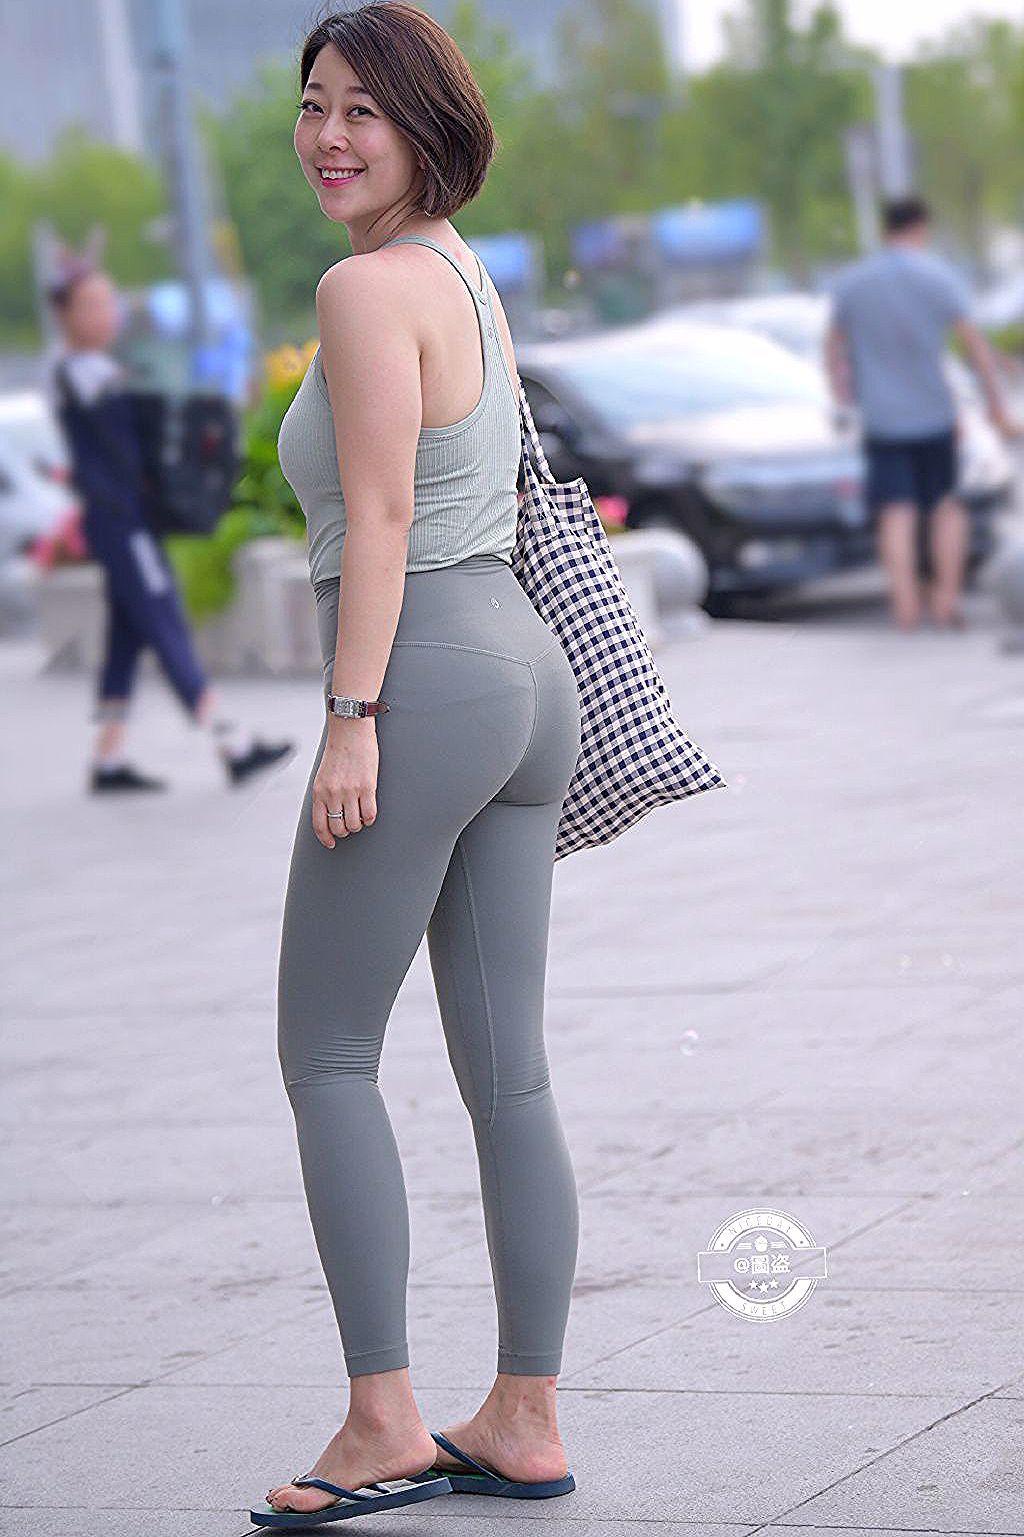 Asian mature curvy shorts